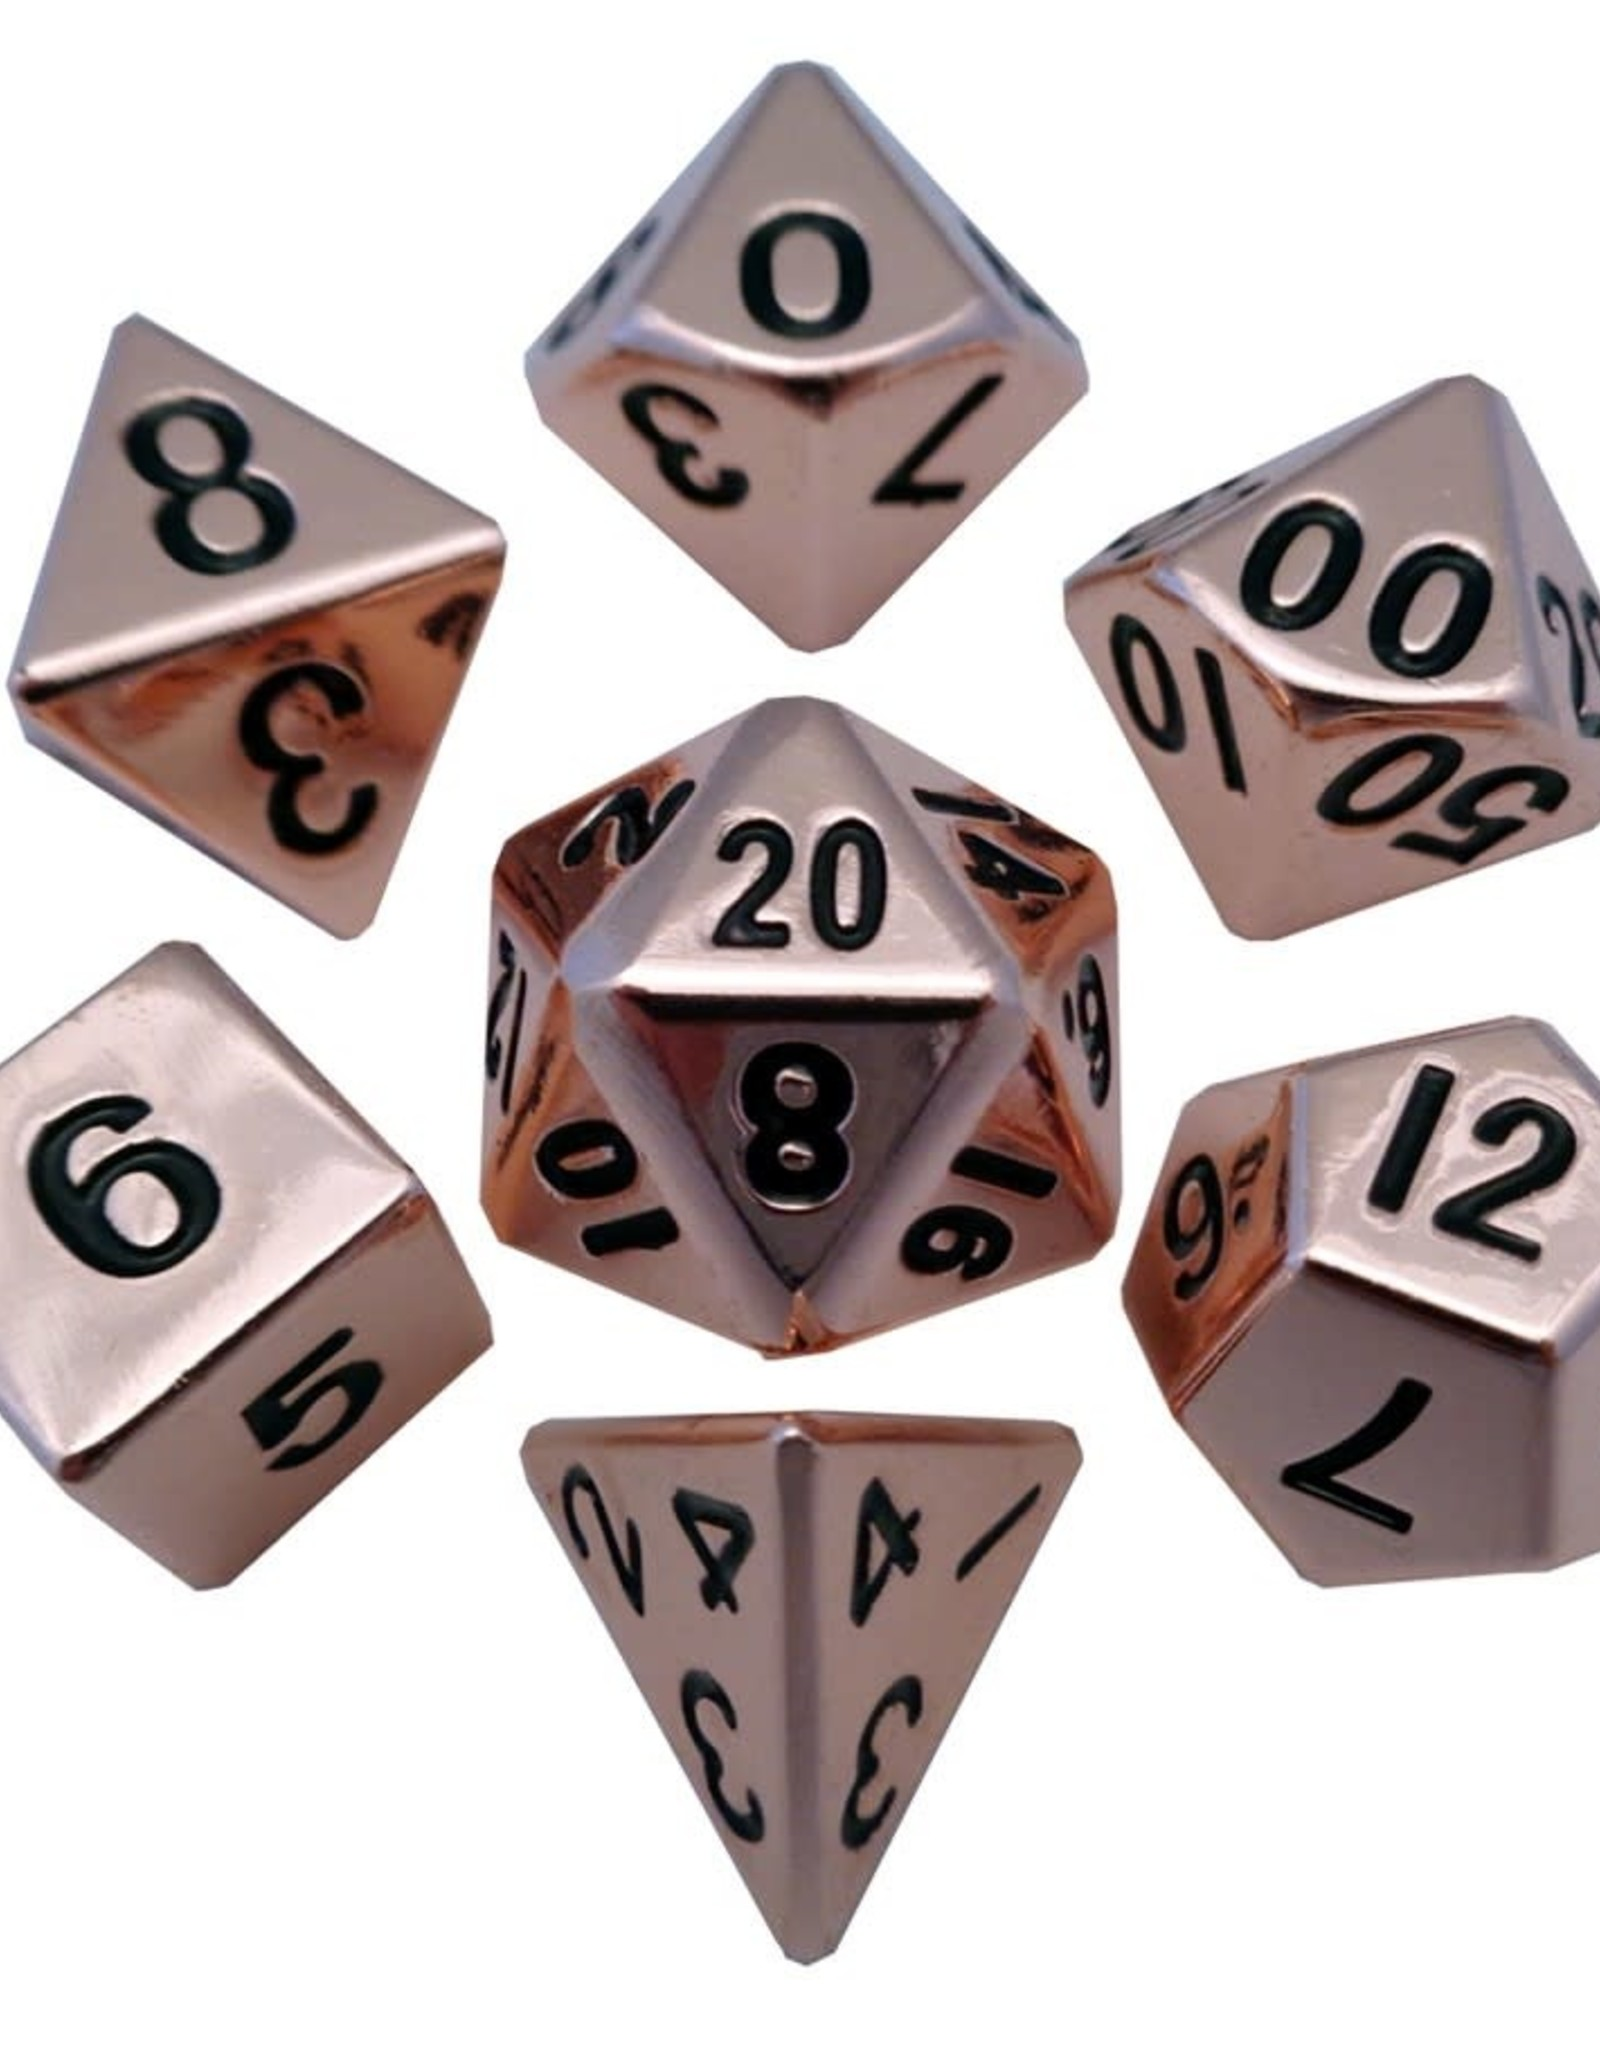 Metallic Dice Games Polyhedral Dice Set: 16mm Copper Metal